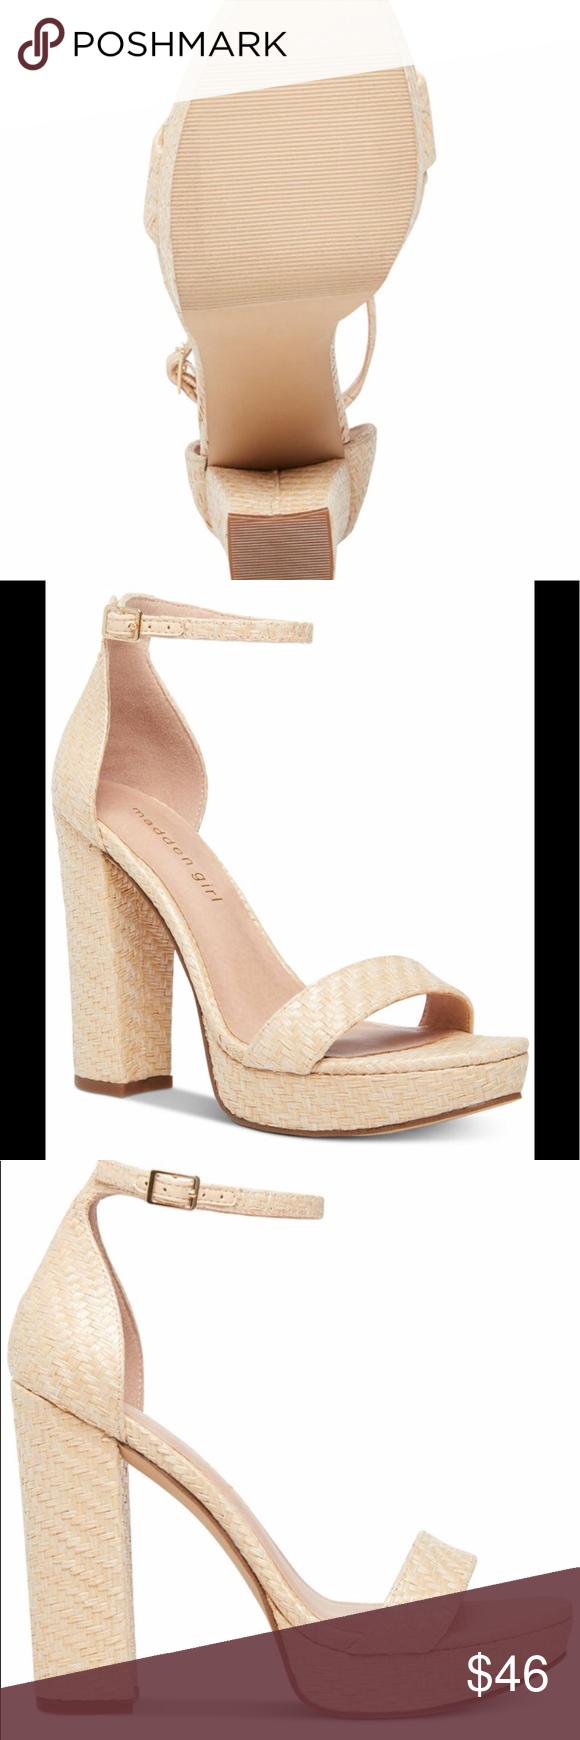 NWT Madden Girl Suzy Platform Sandals